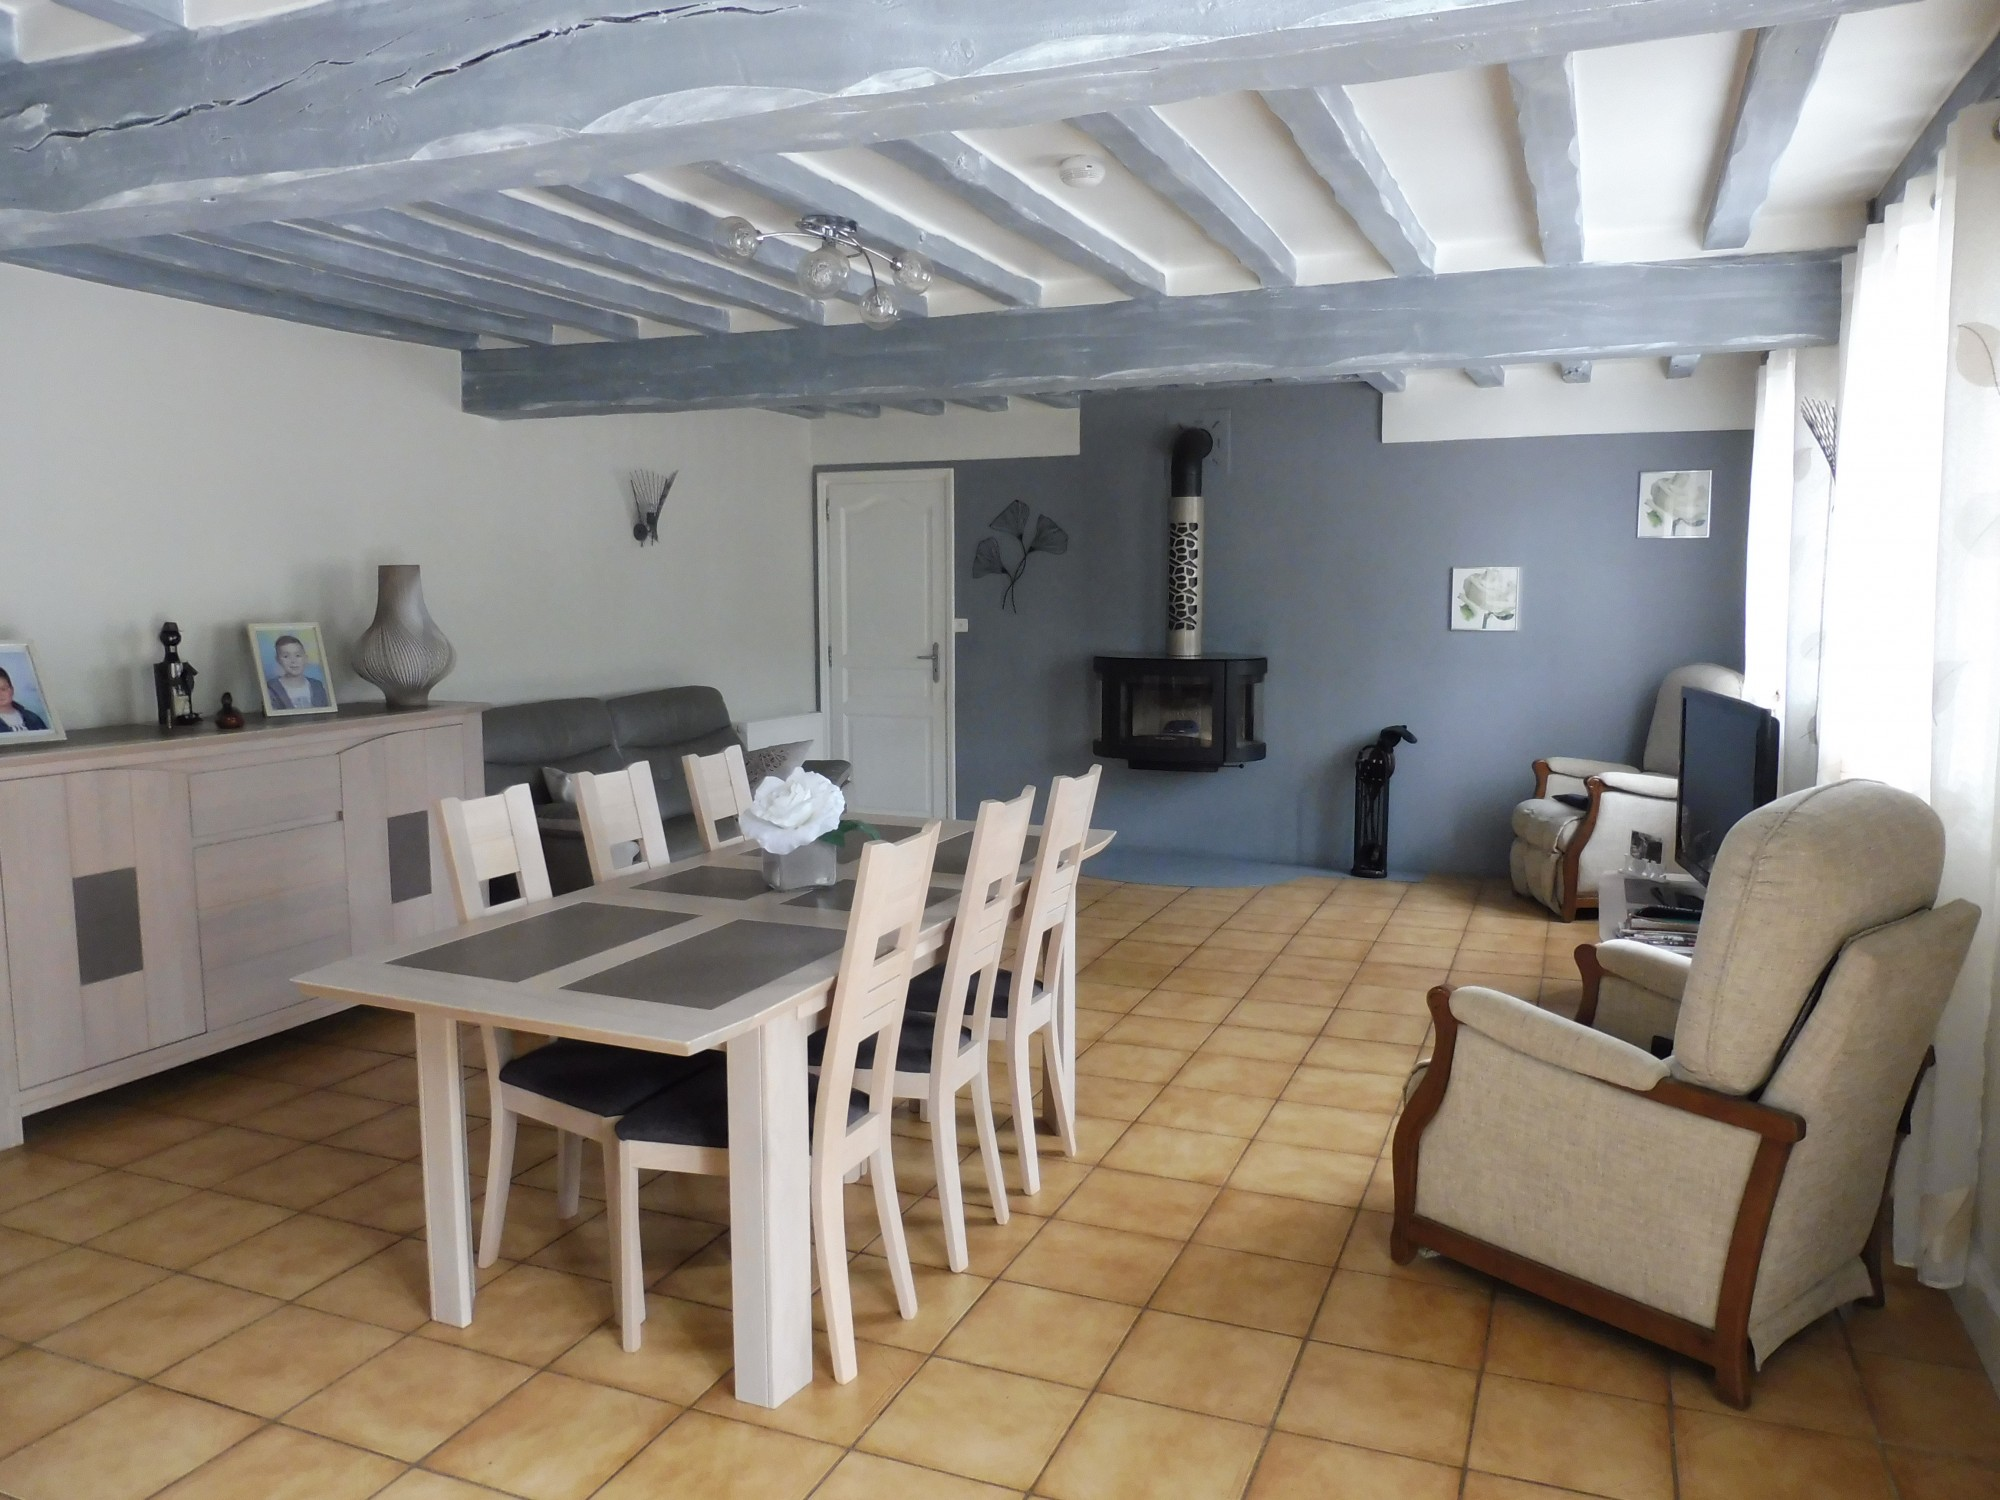 A vendre maison de ville 76190 yvetot terres et demeures for Agence immobiliere yvetot